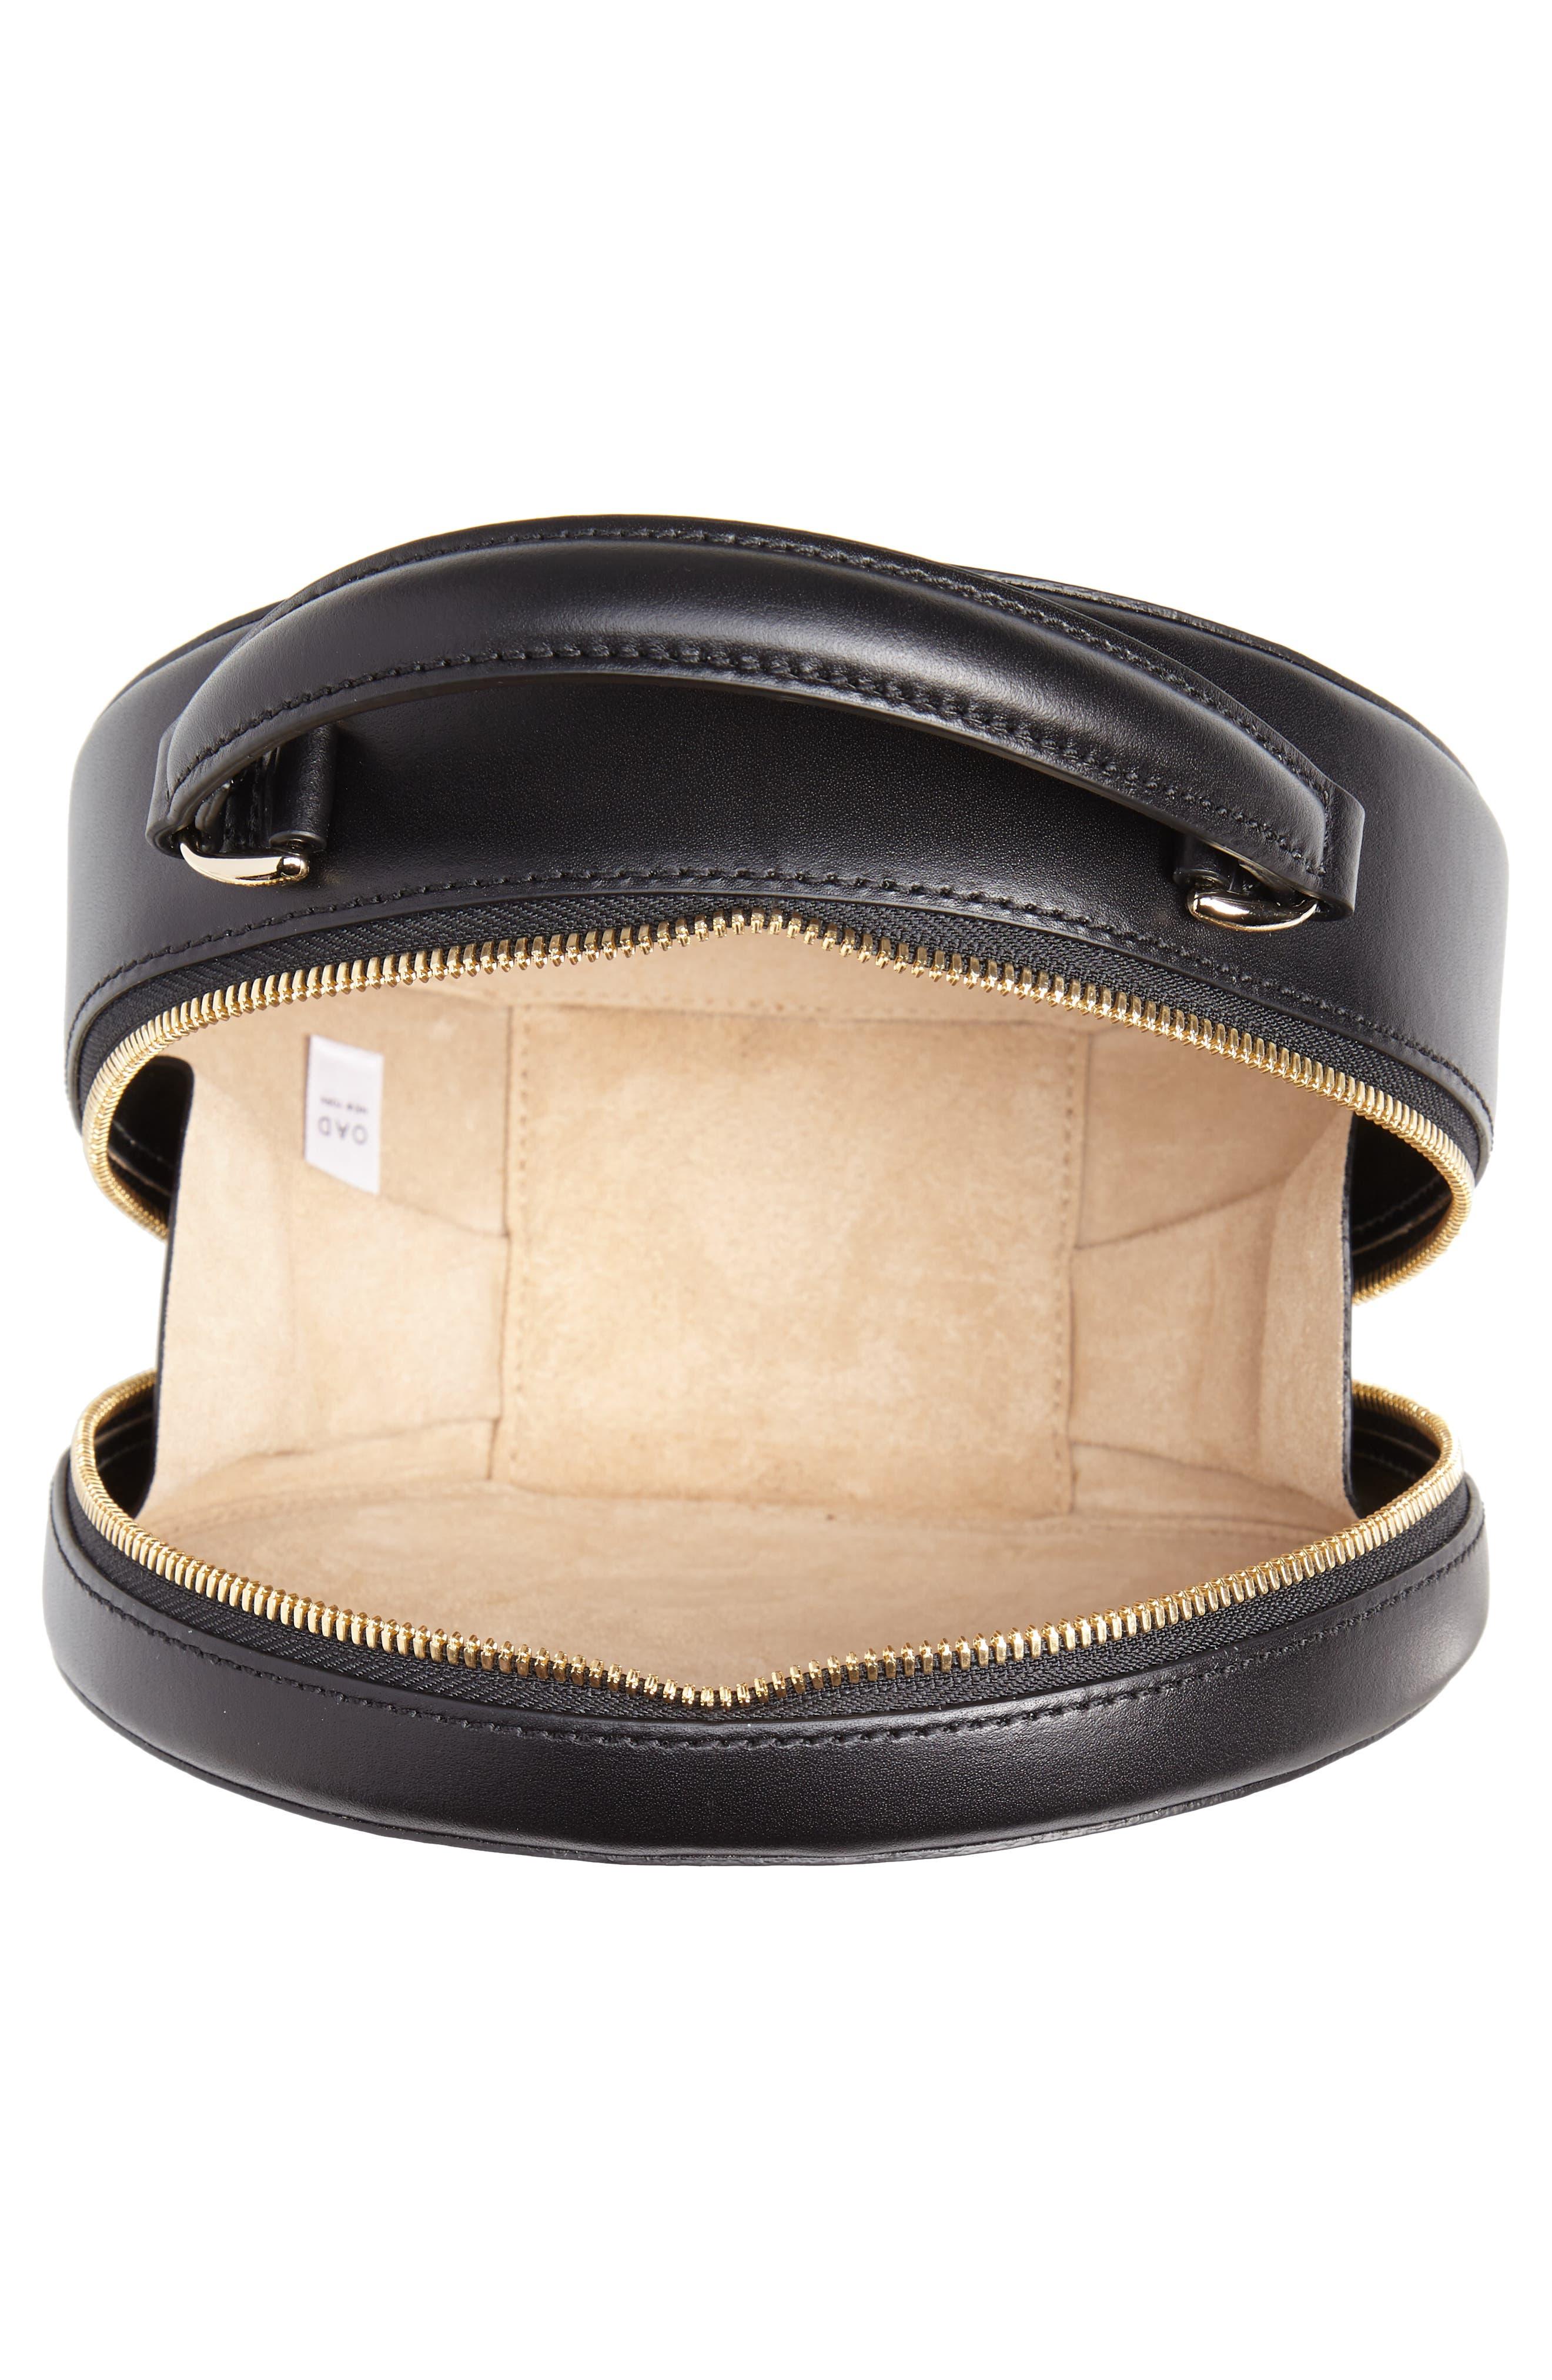 Mini Circle Pebbled Leather Satchel,                             Alternate thumbnail 4, color,                             TRUE BLACK